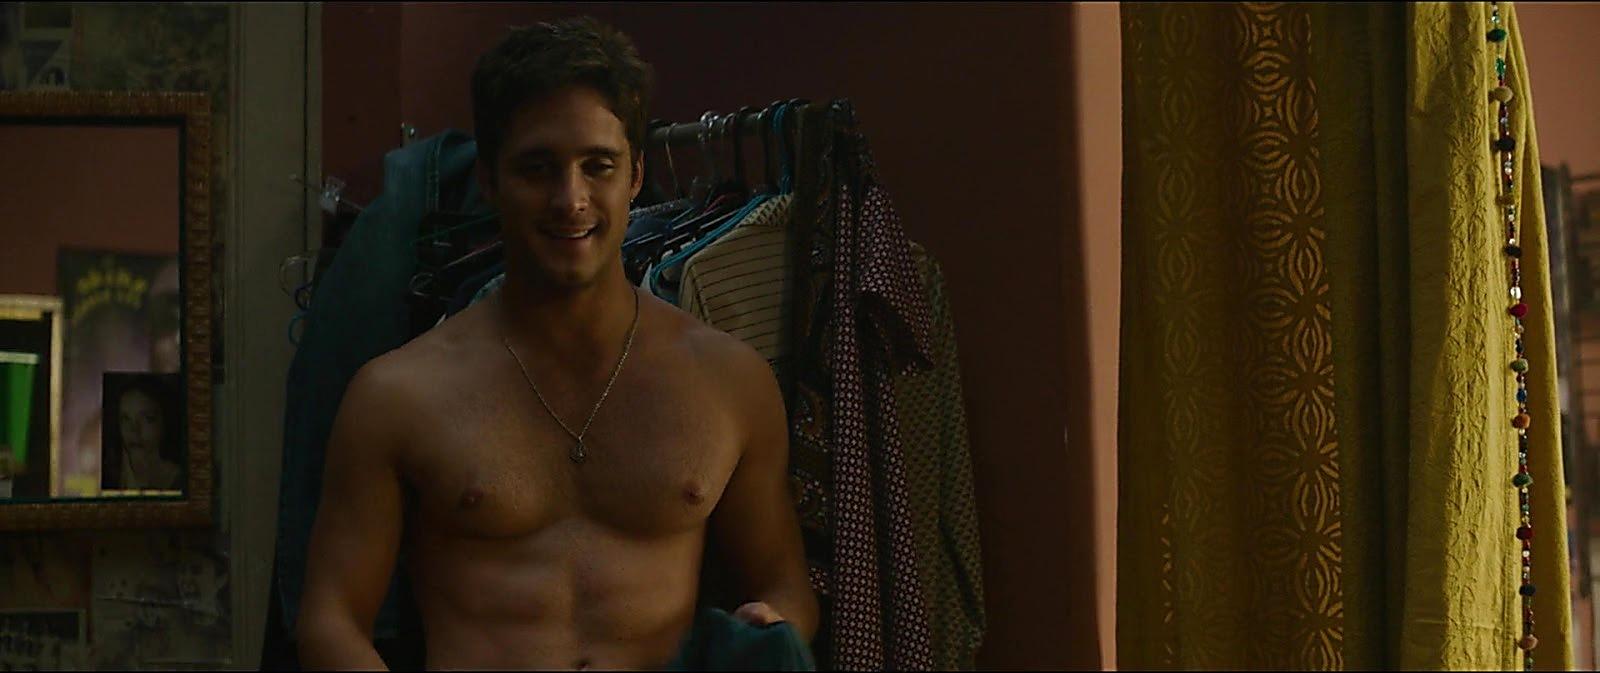 Diego Boneta sexy shirtless scene February 29, 2020, 6am